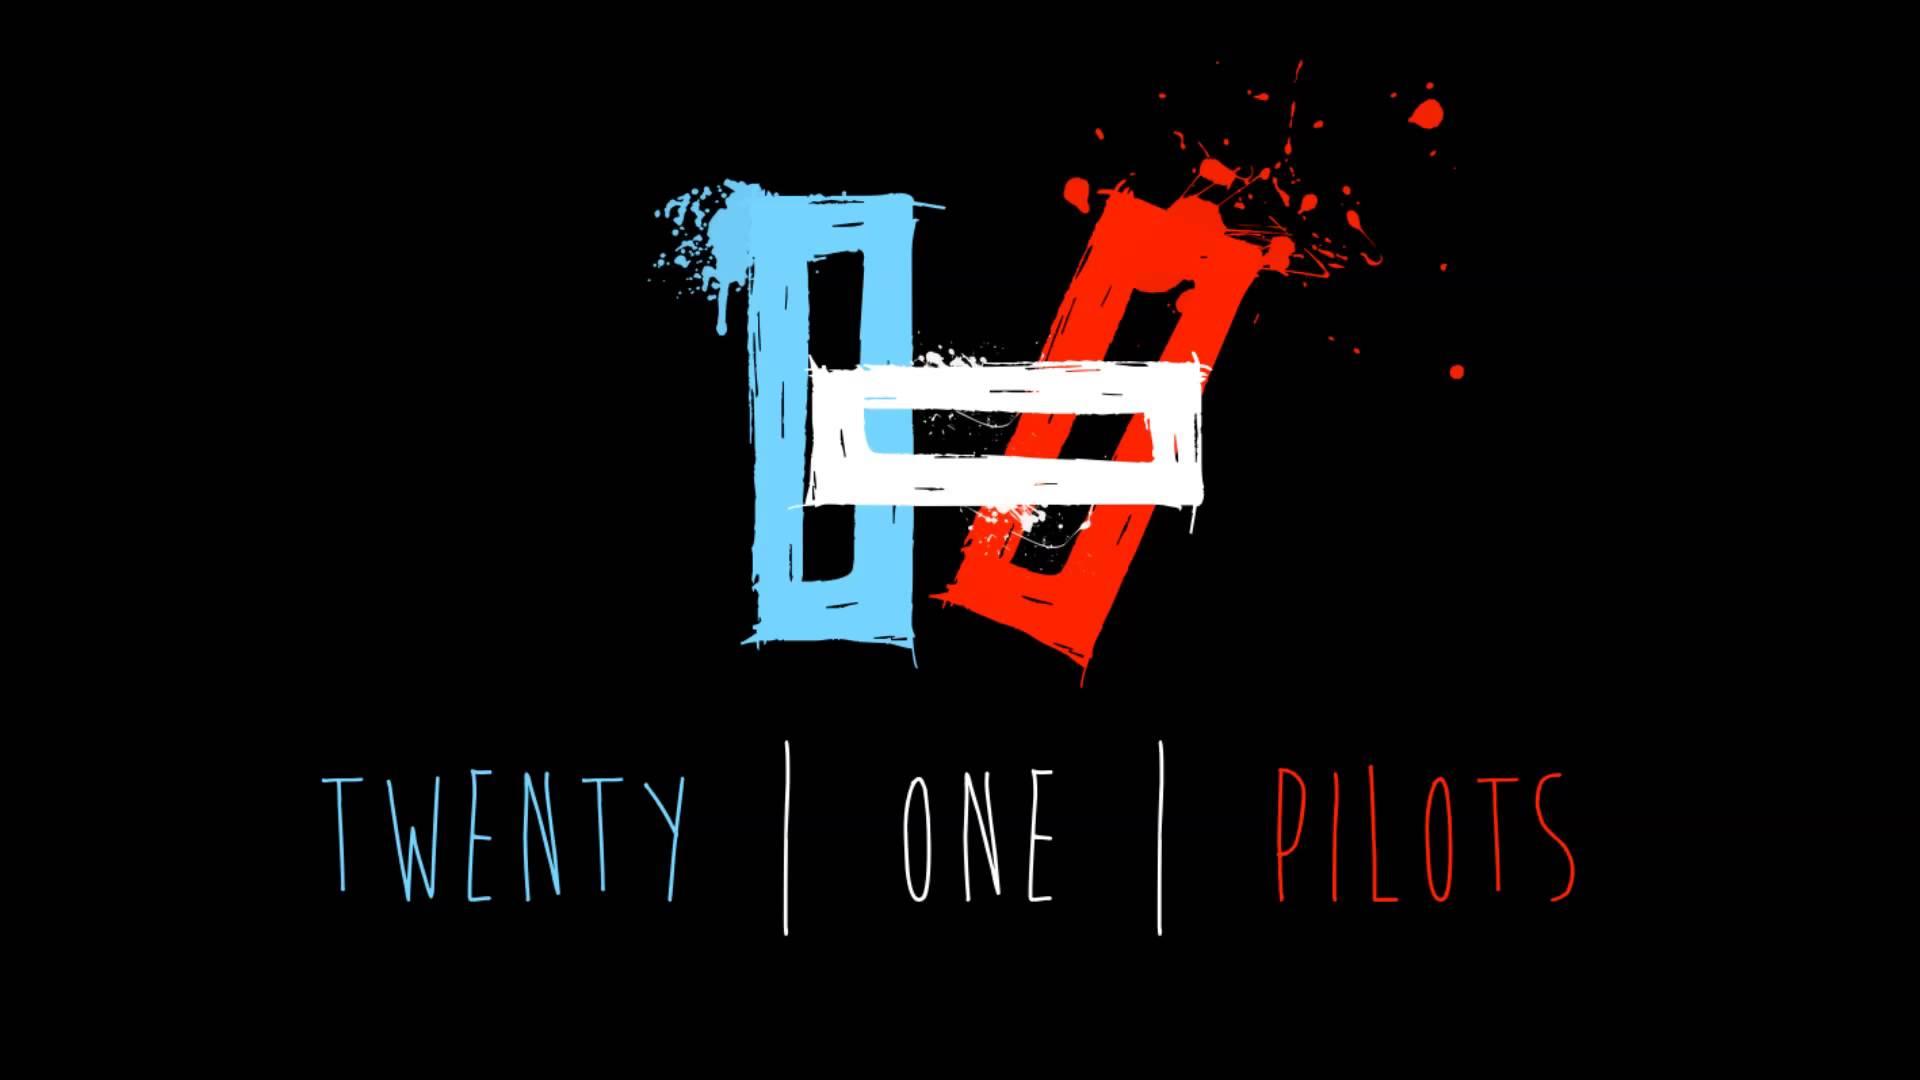 Twenty One Pilots Hd Wallpapers Top Free Twenty One Pilots Hd